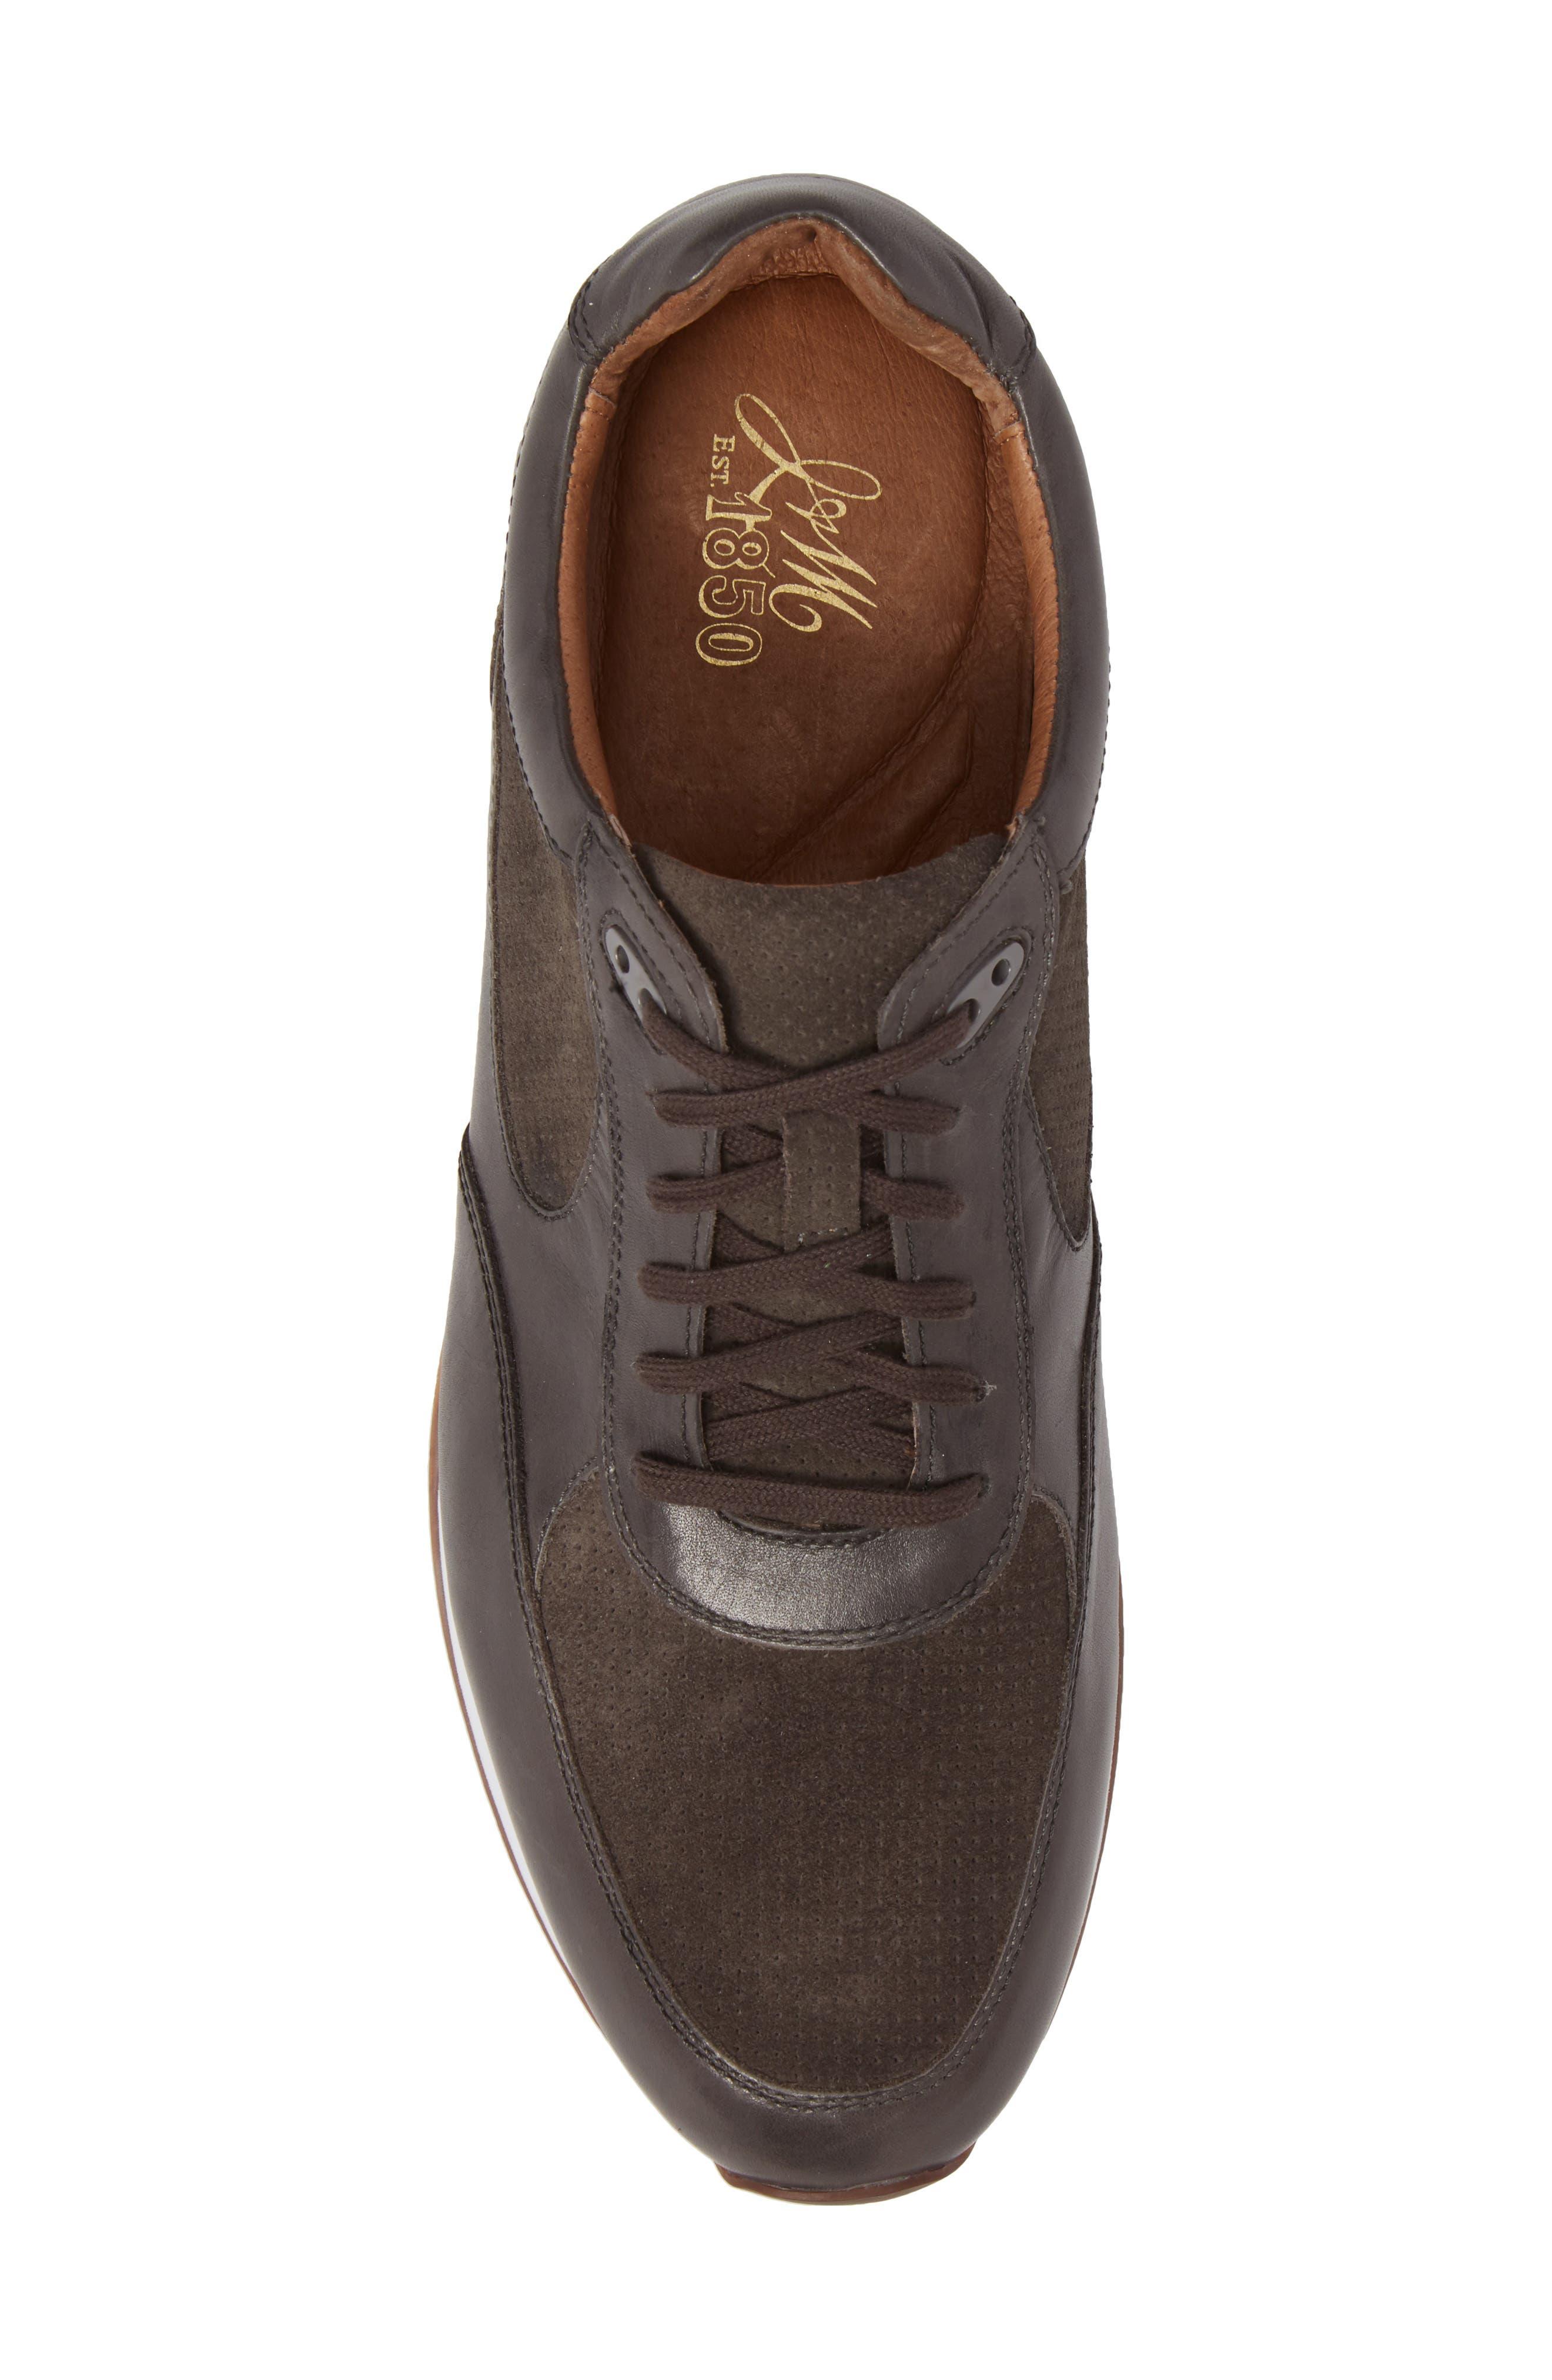 Malek Low Top Sneaker,                             Alternate thumbnail 5, color,                             020